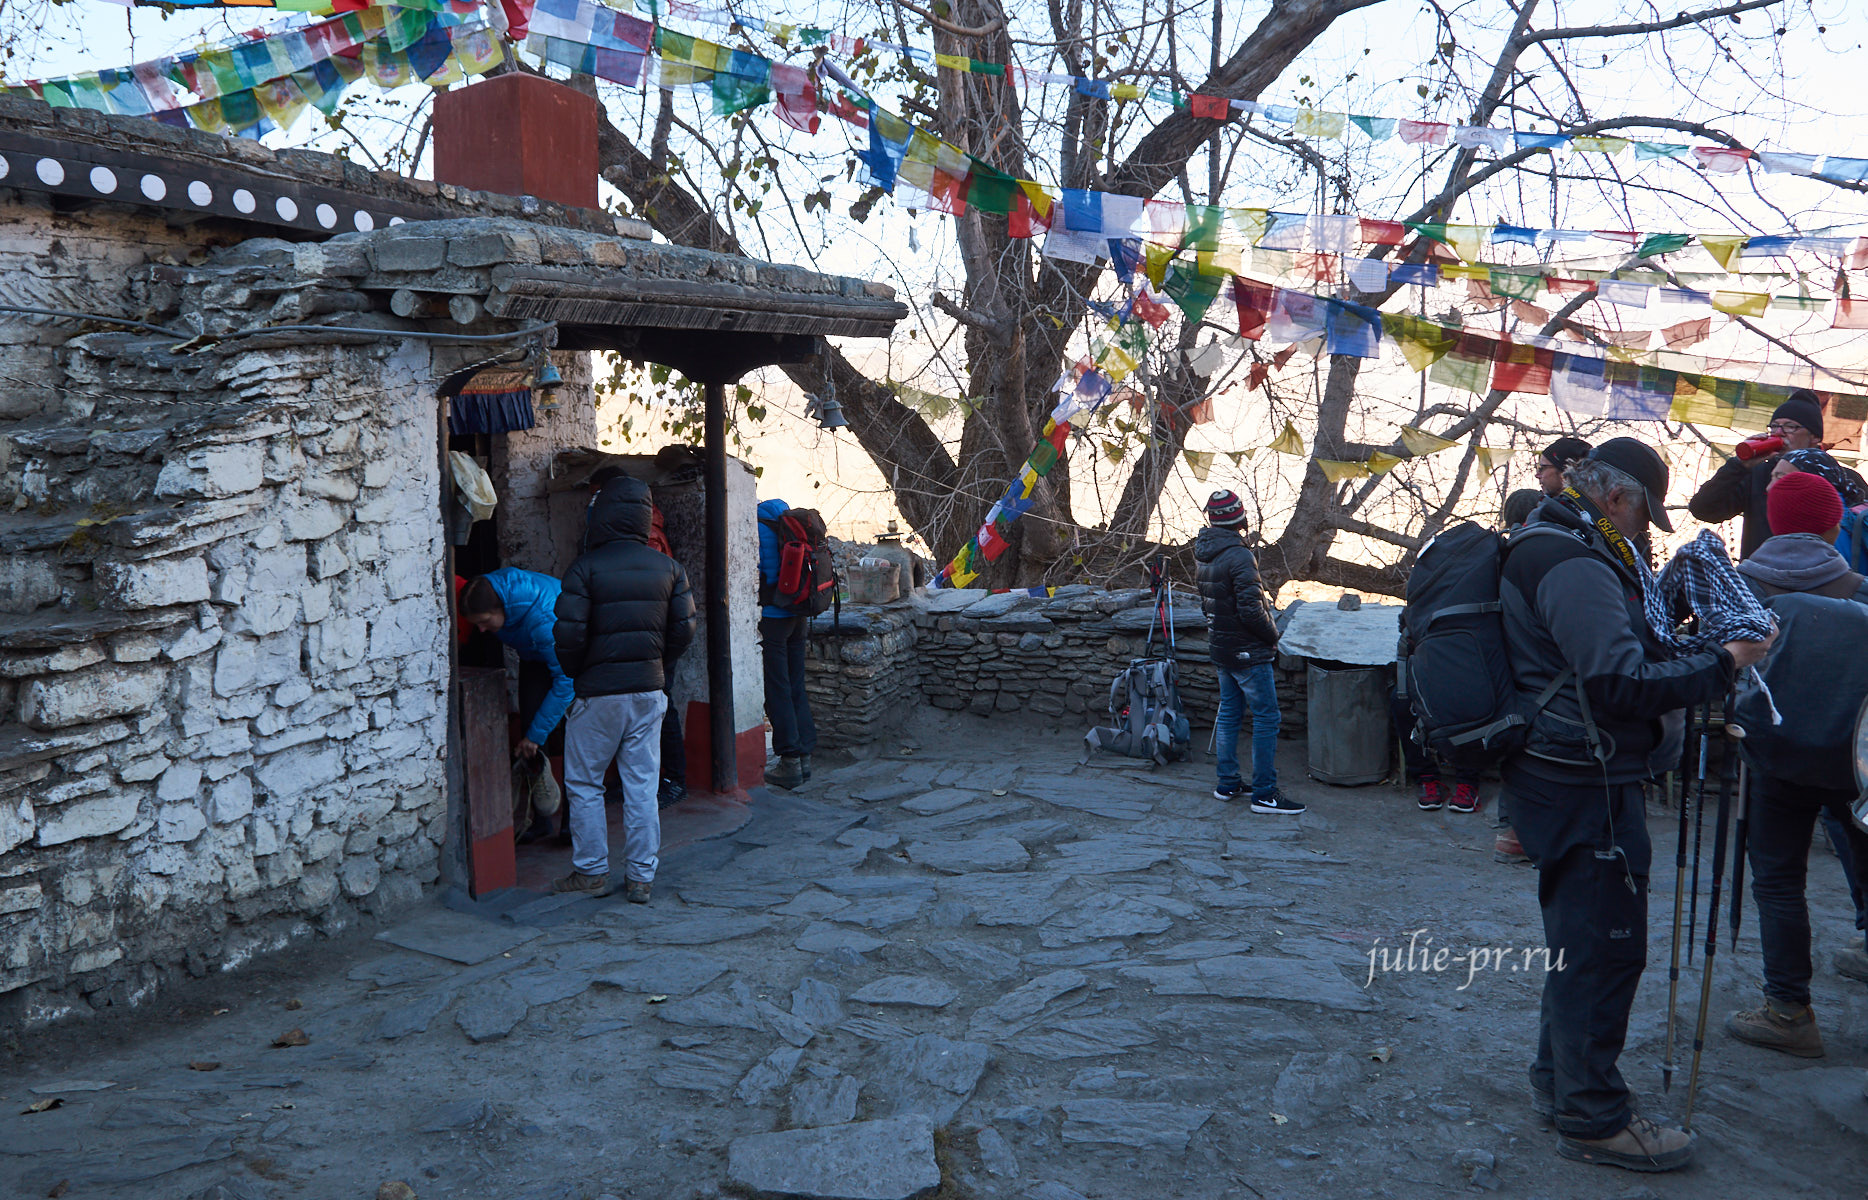 Непал, Муктинатх, Dhola Mebar (Fire) Gompa